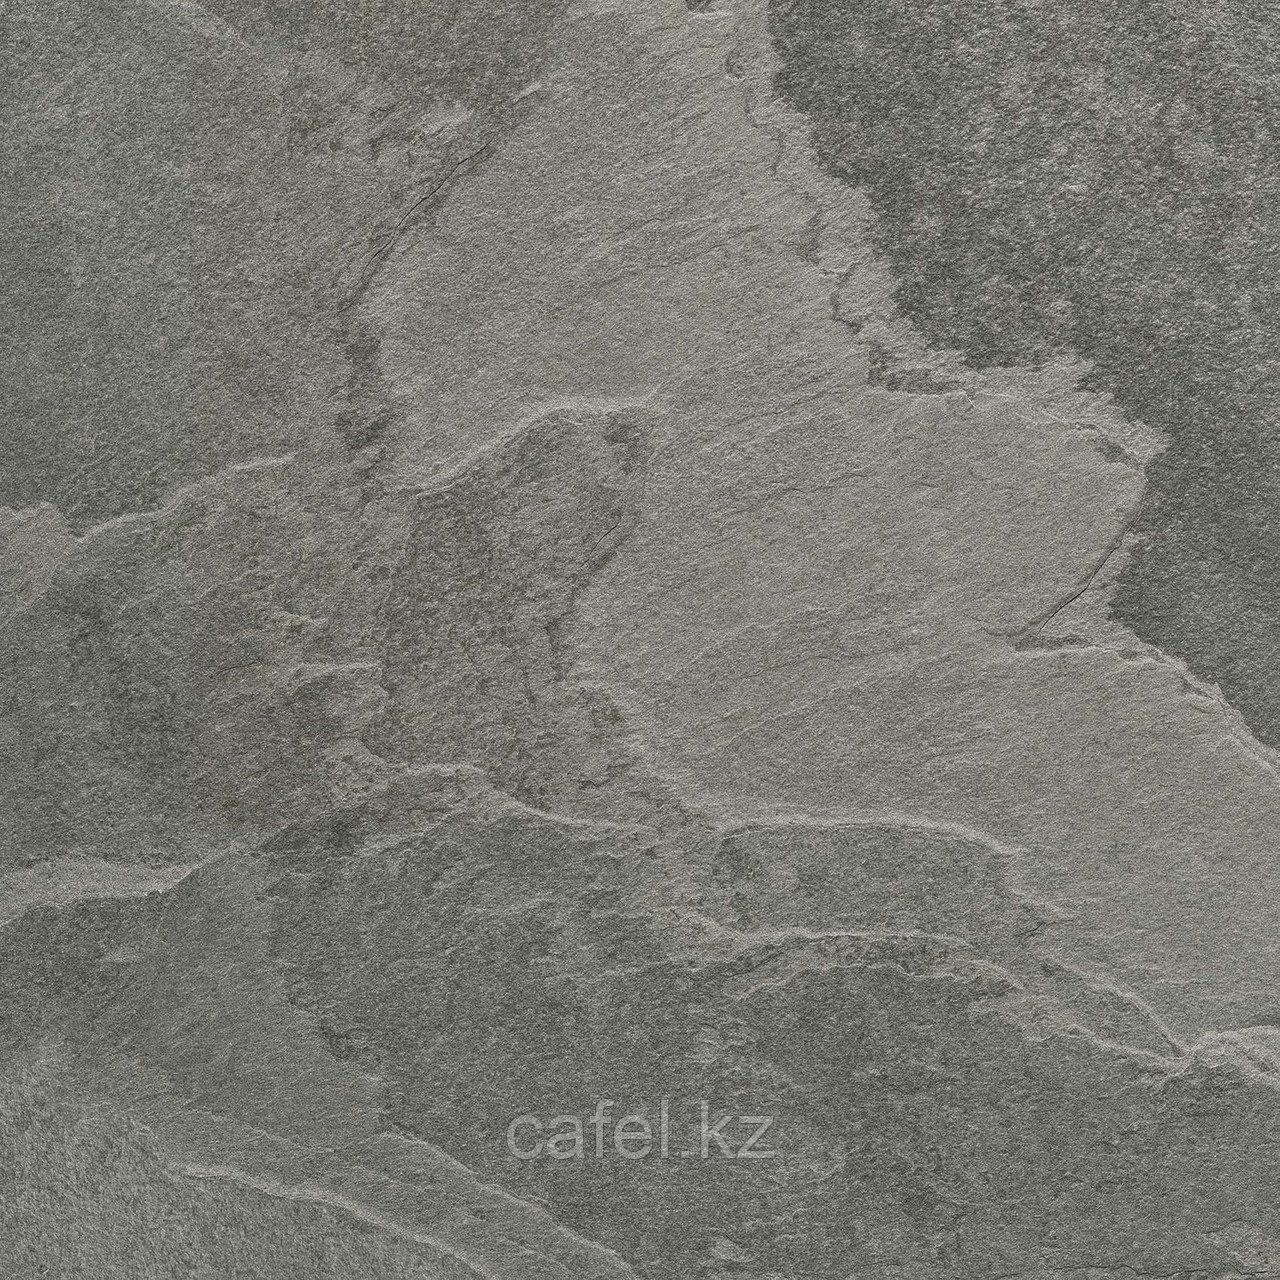 Керамогранит 60х60 Вашингтон | Washington темно-серый